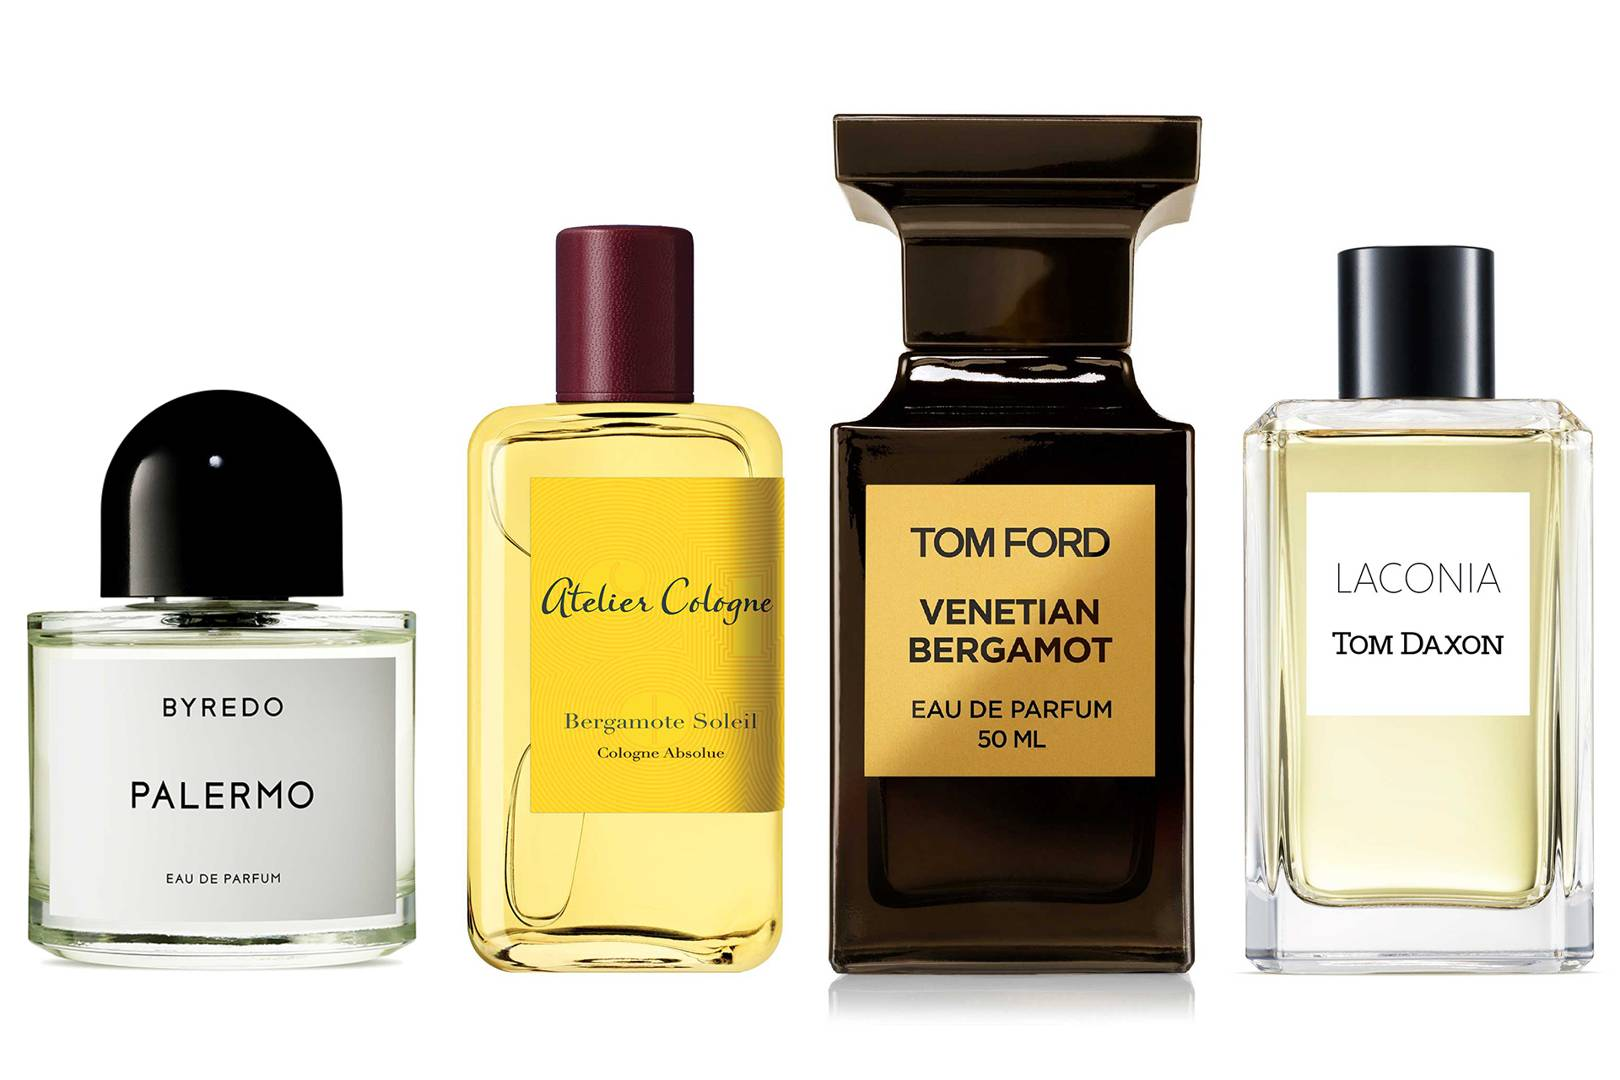 Best Bergamot Fragrances 2019 British Gq